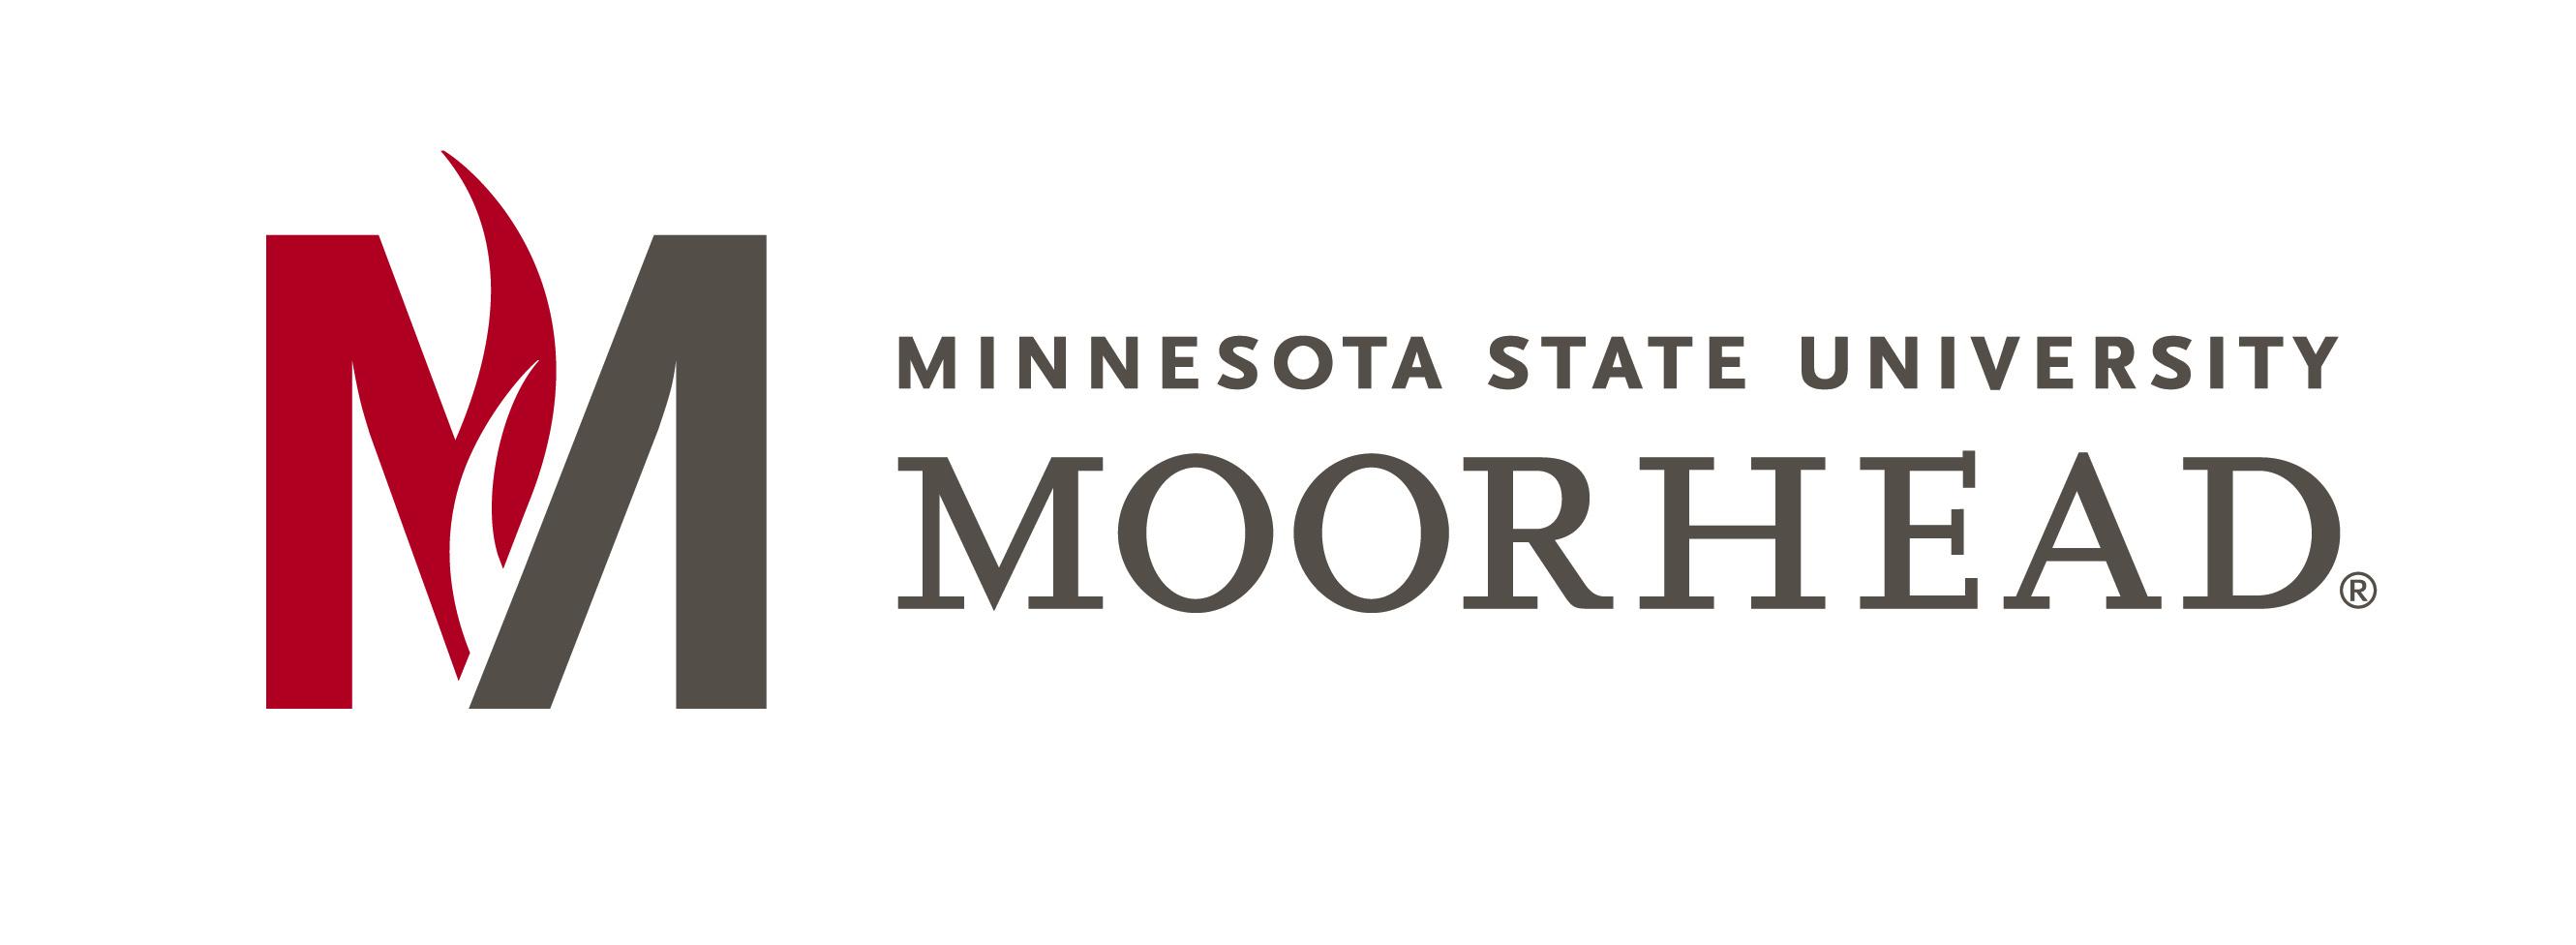 Minnesota State University Moorhead In University Of Mn Tc Calendar